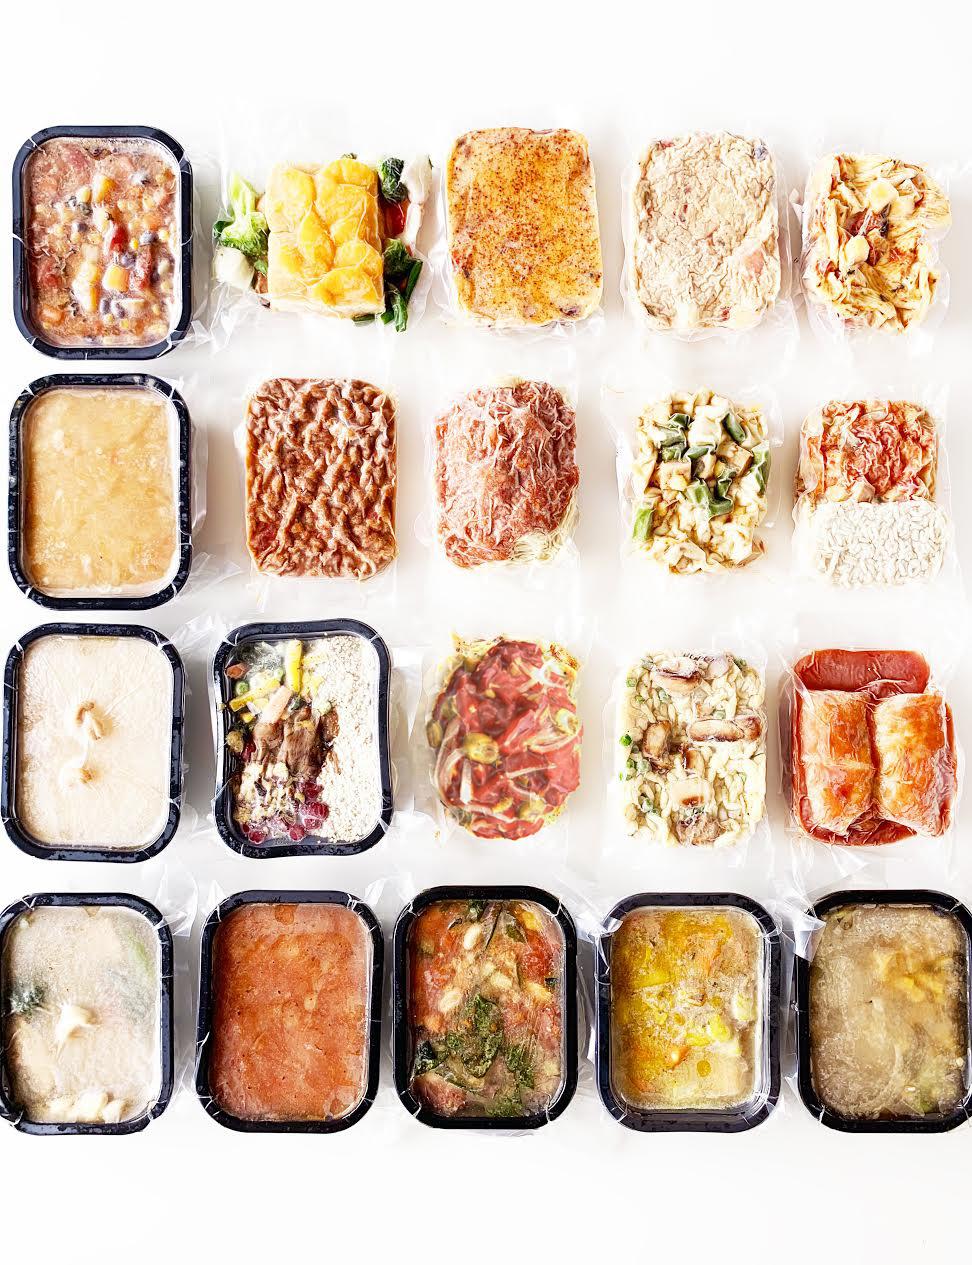 Vegan Meals Box